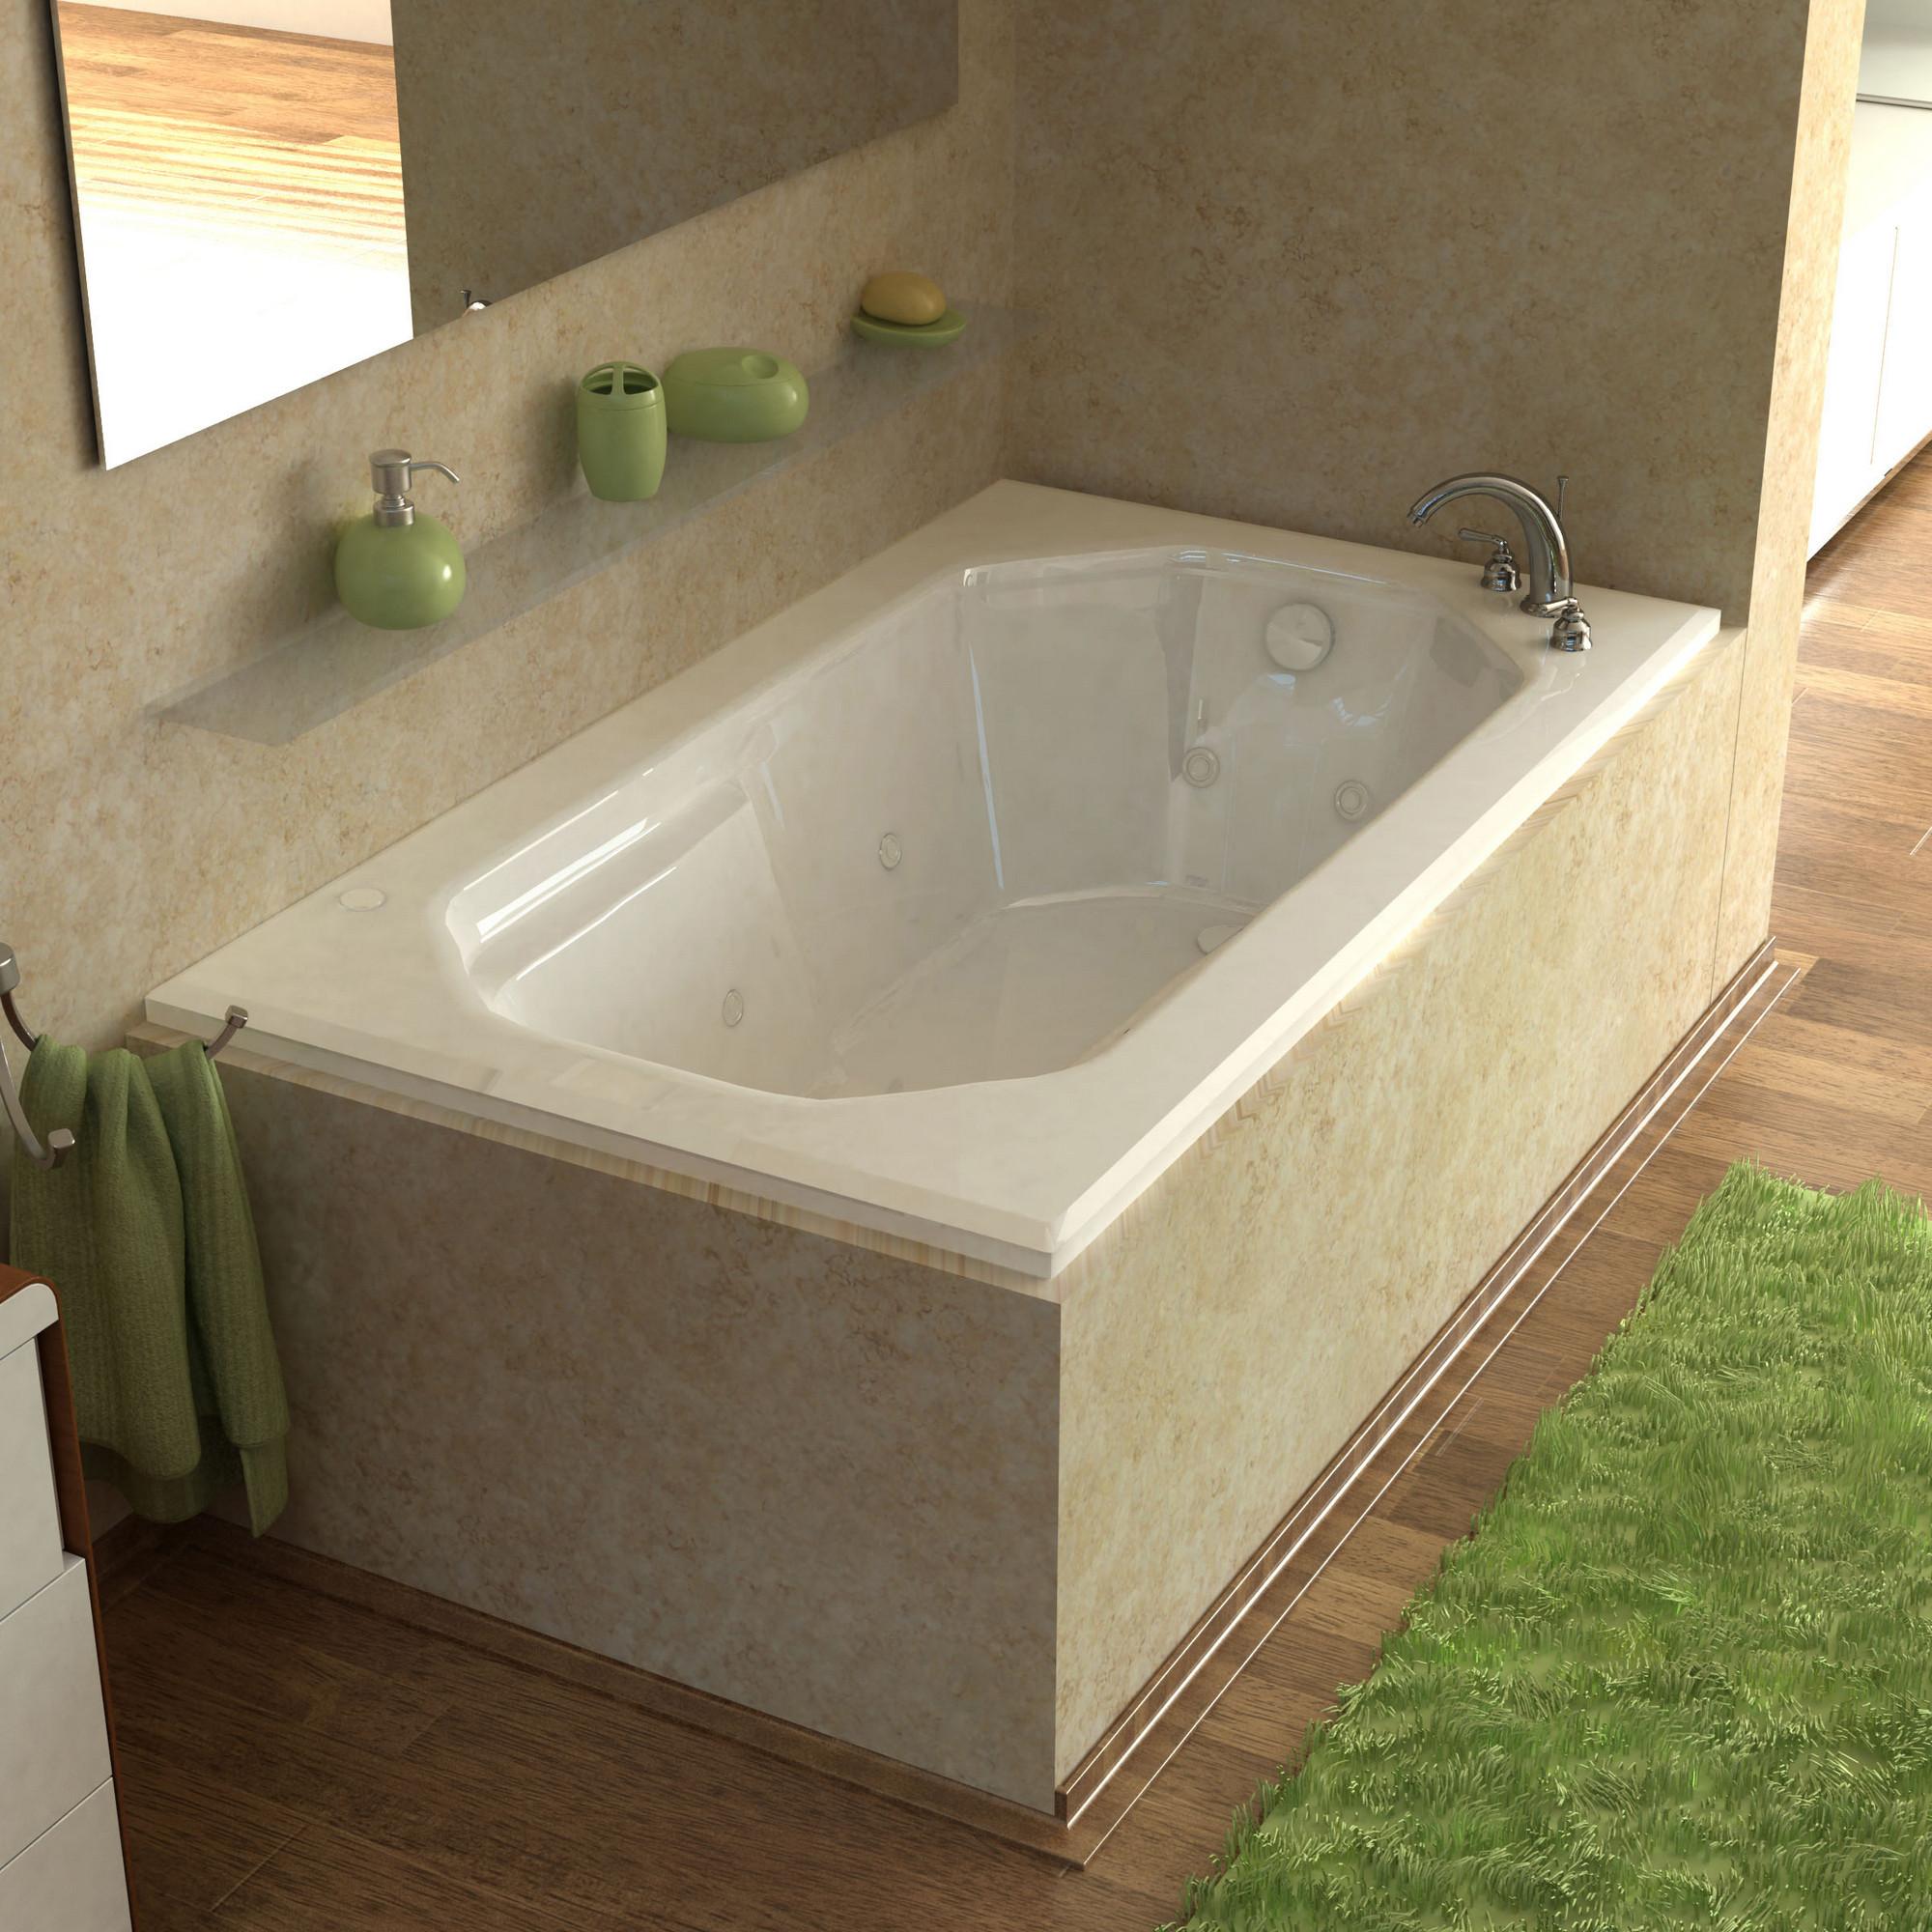 MediTub 3660MWL Atlantis Mirage Drop In Whirlpool Bathtub With Left Drain